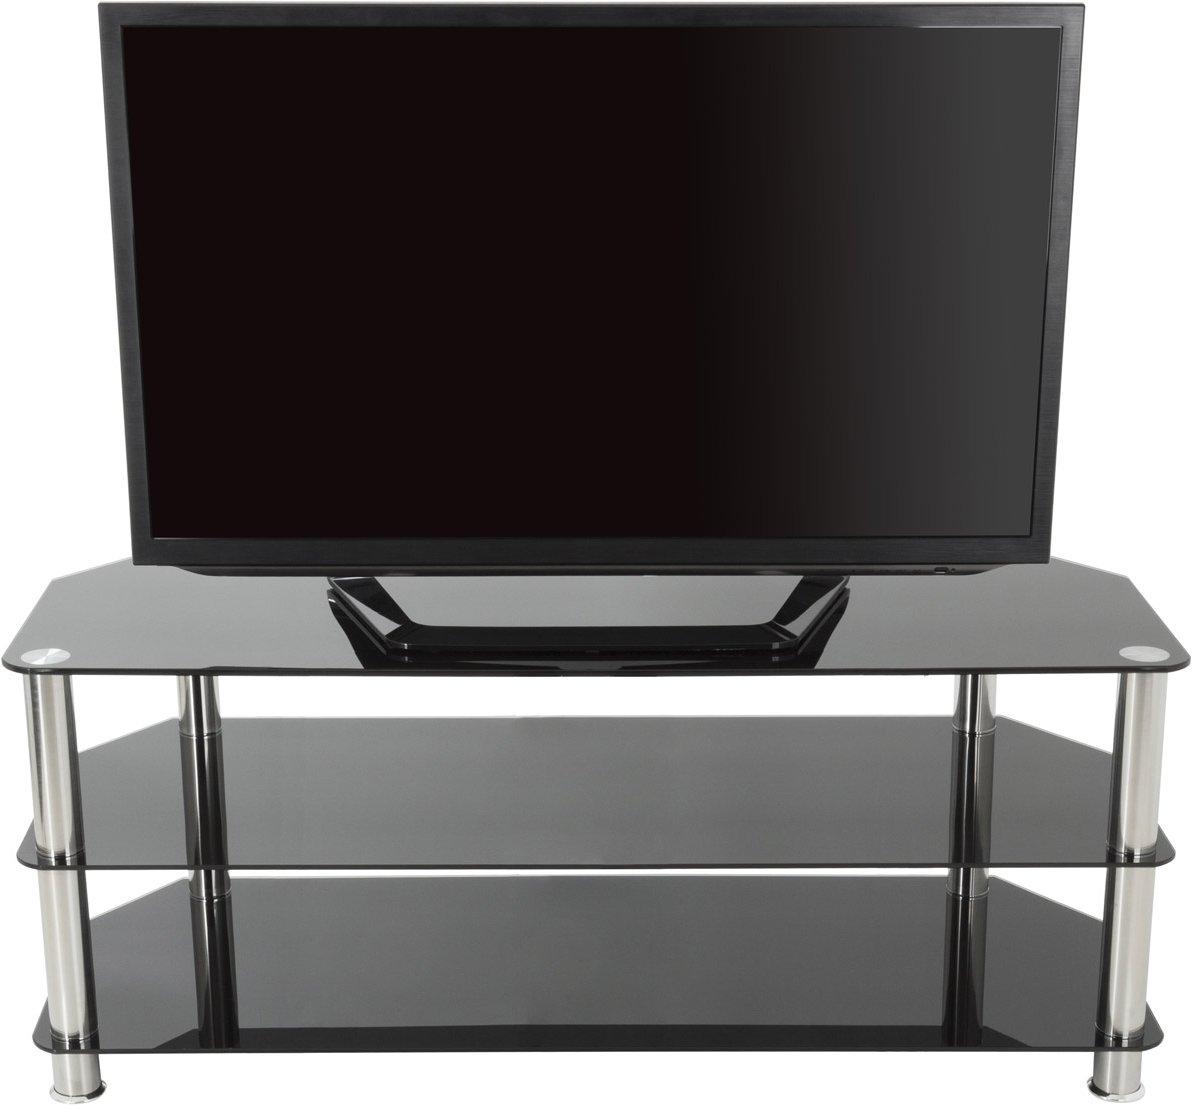 Avf Sdc1250 Tv Stands